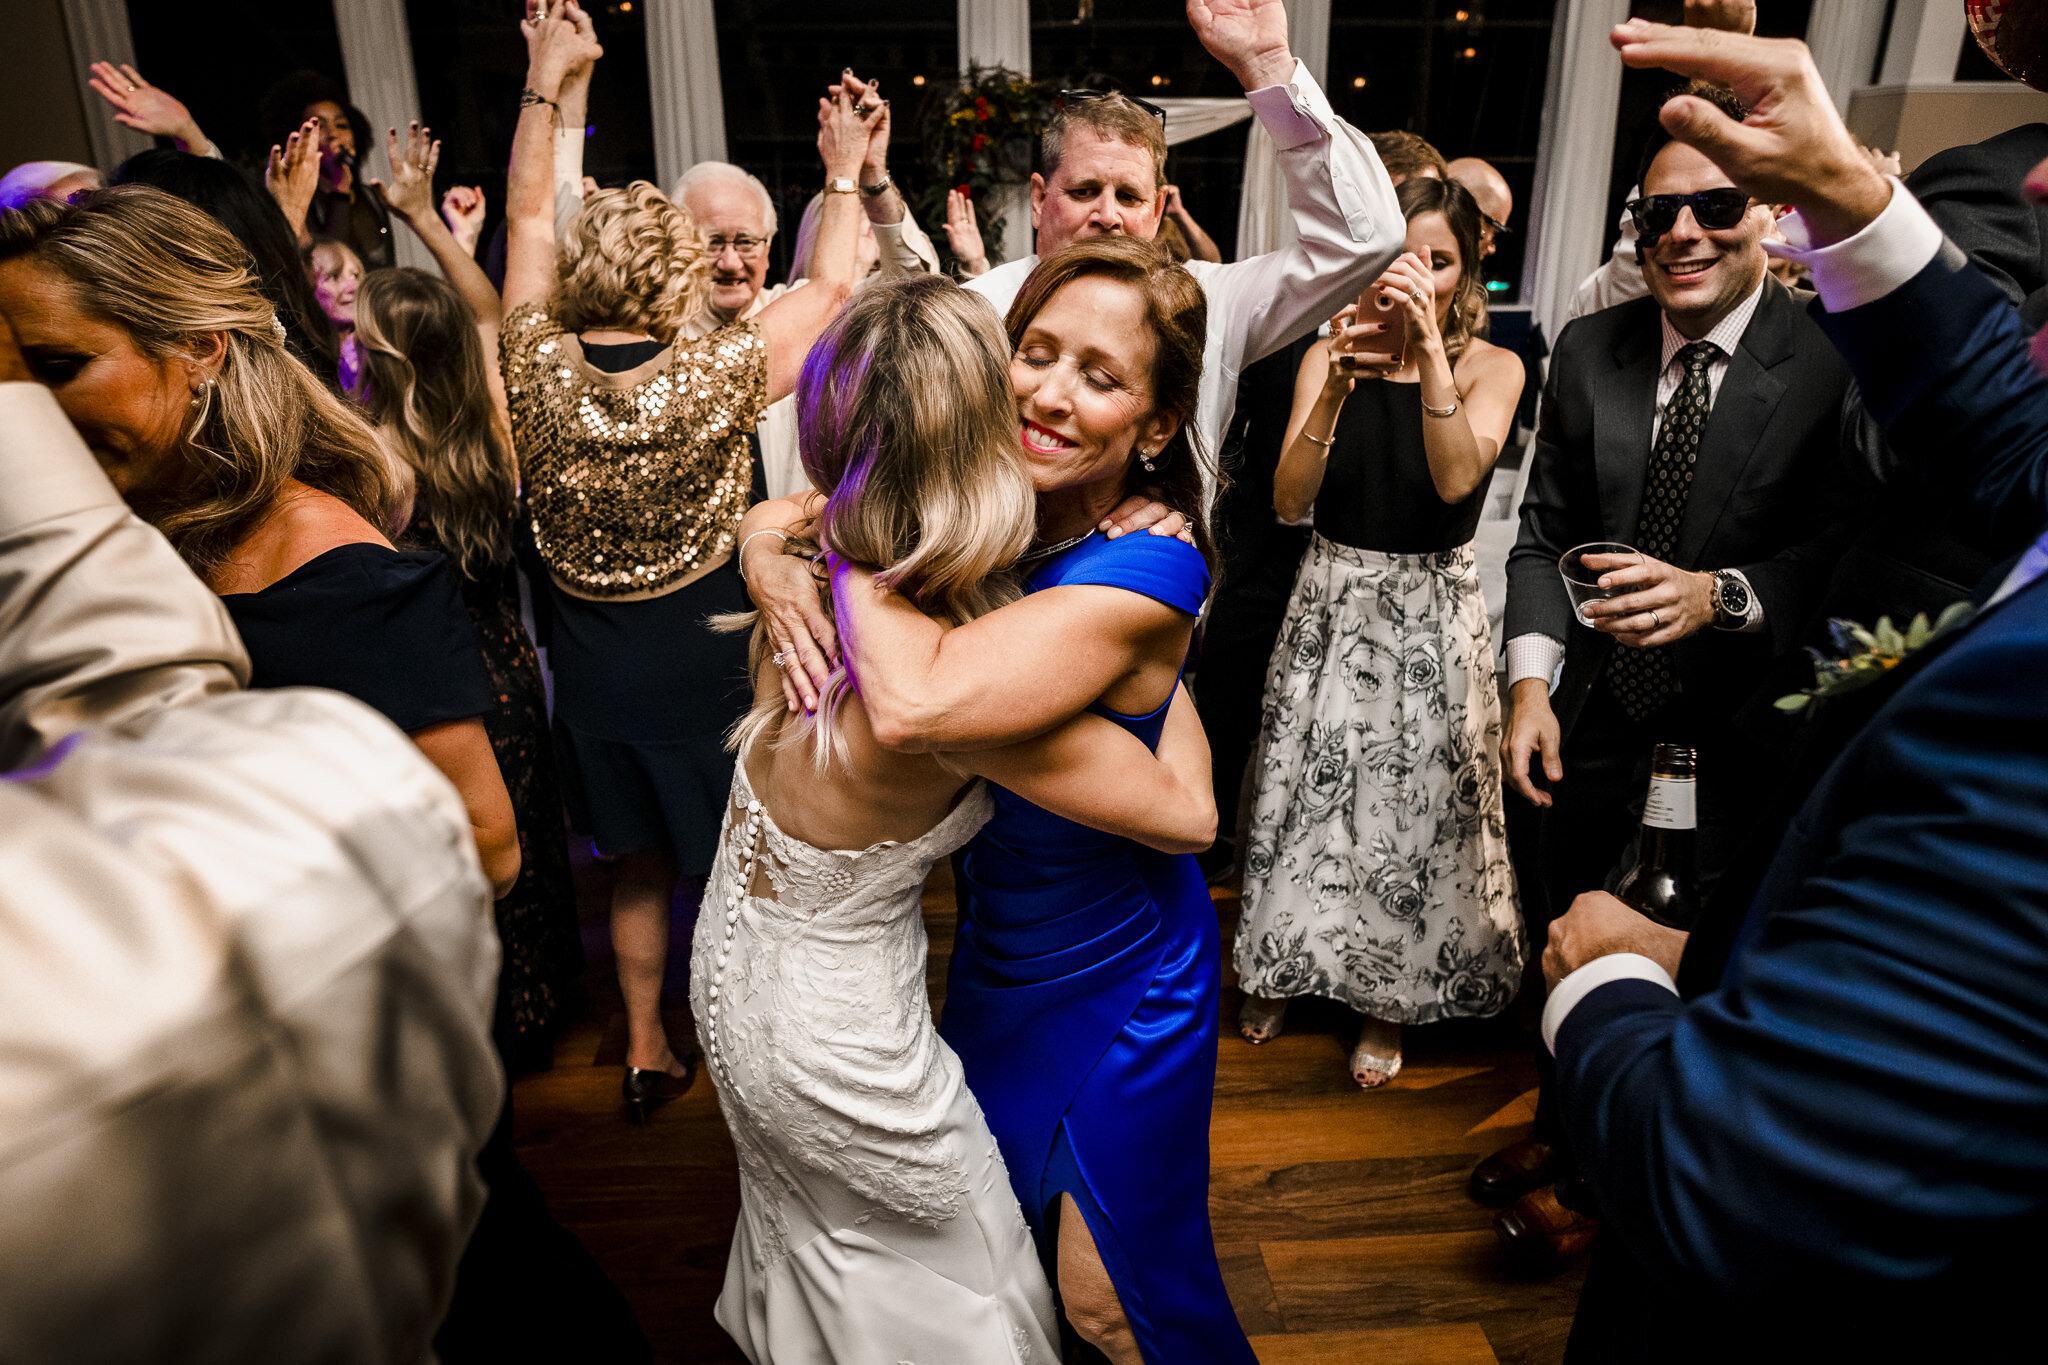 Snell-Ocean-City-Yacht-Club-New-Jersey-Wedding-Photographer-48.JPG